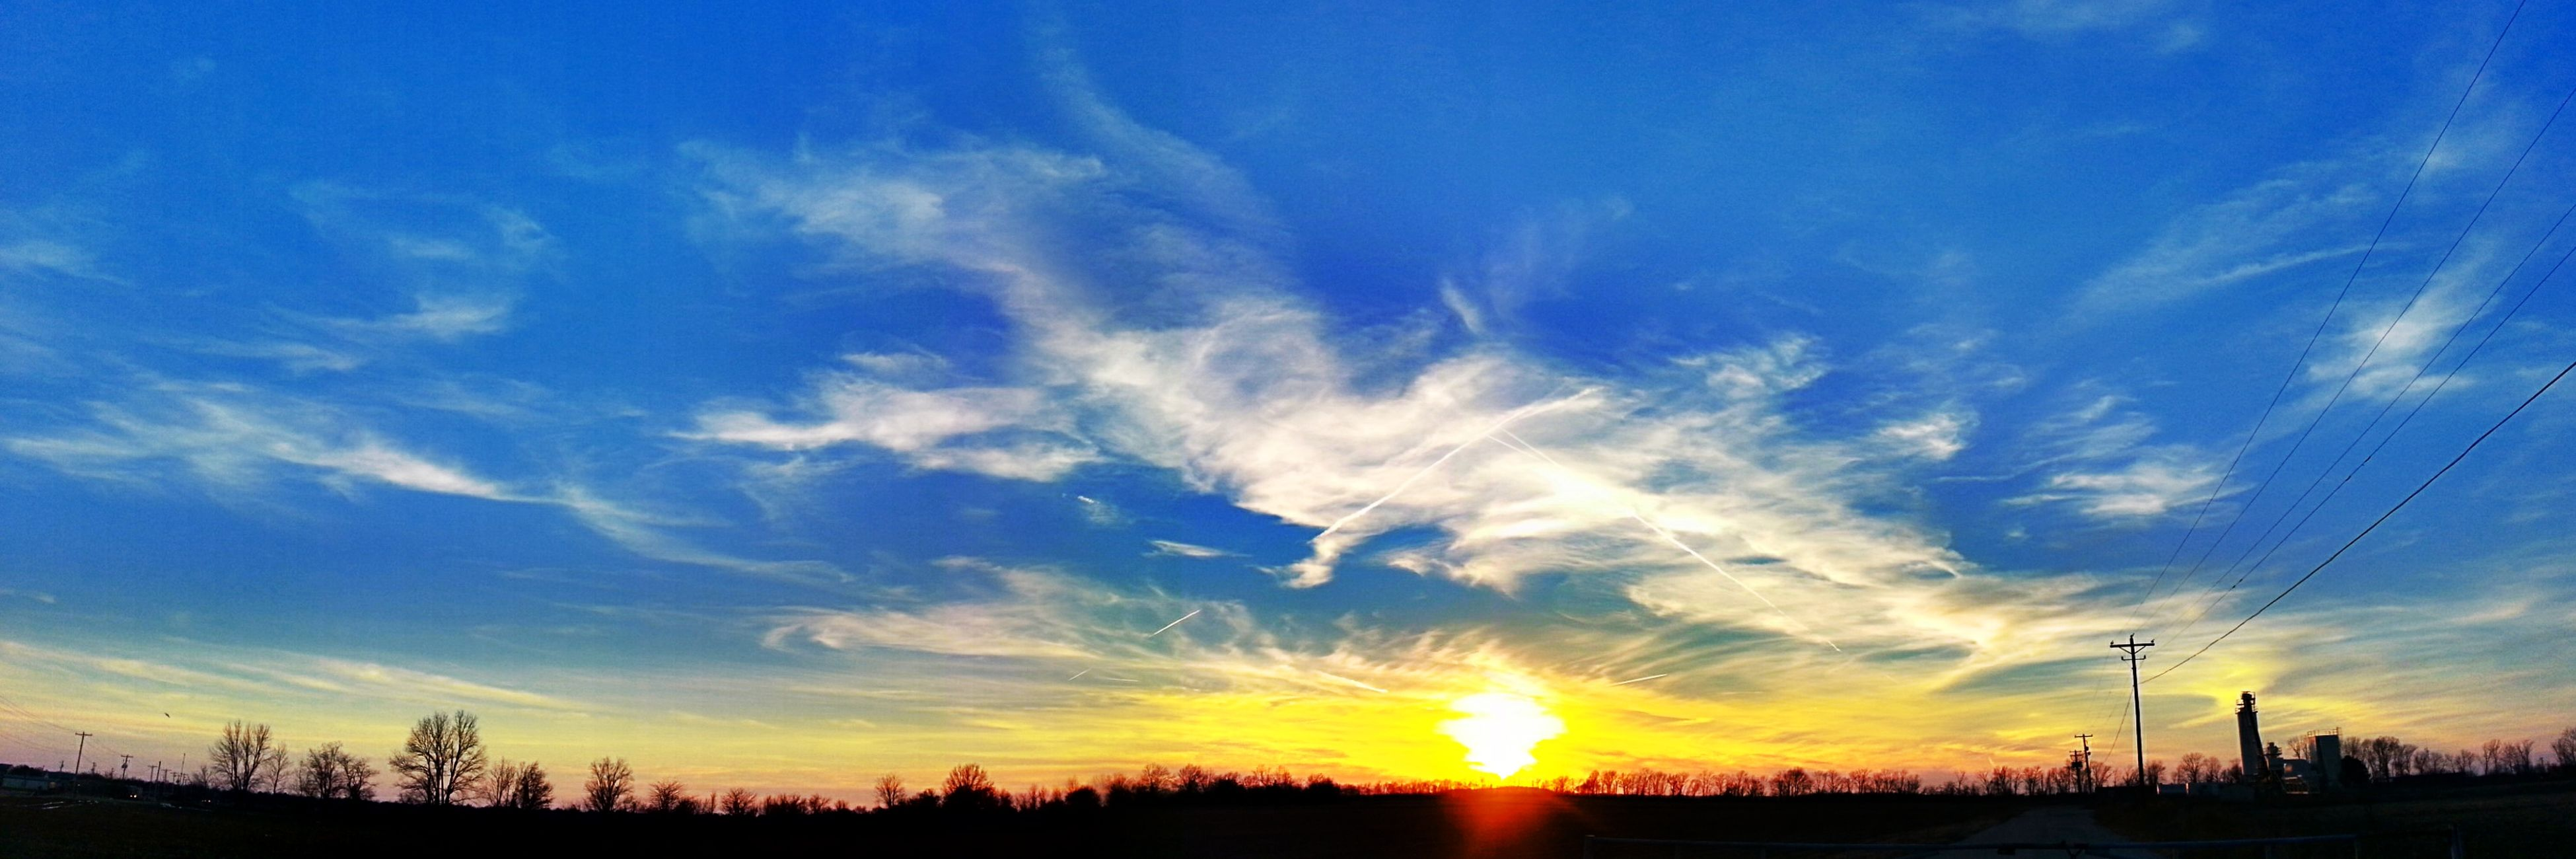 sunset, sun, silhouette, sky, scenics, beauty in nature, tranquil scene, tranquility, sunlight, sunbeam, orange color, nature, cloud - sky, idyllic, lens flare, landscape, cloud, back lit, blue, low angle view